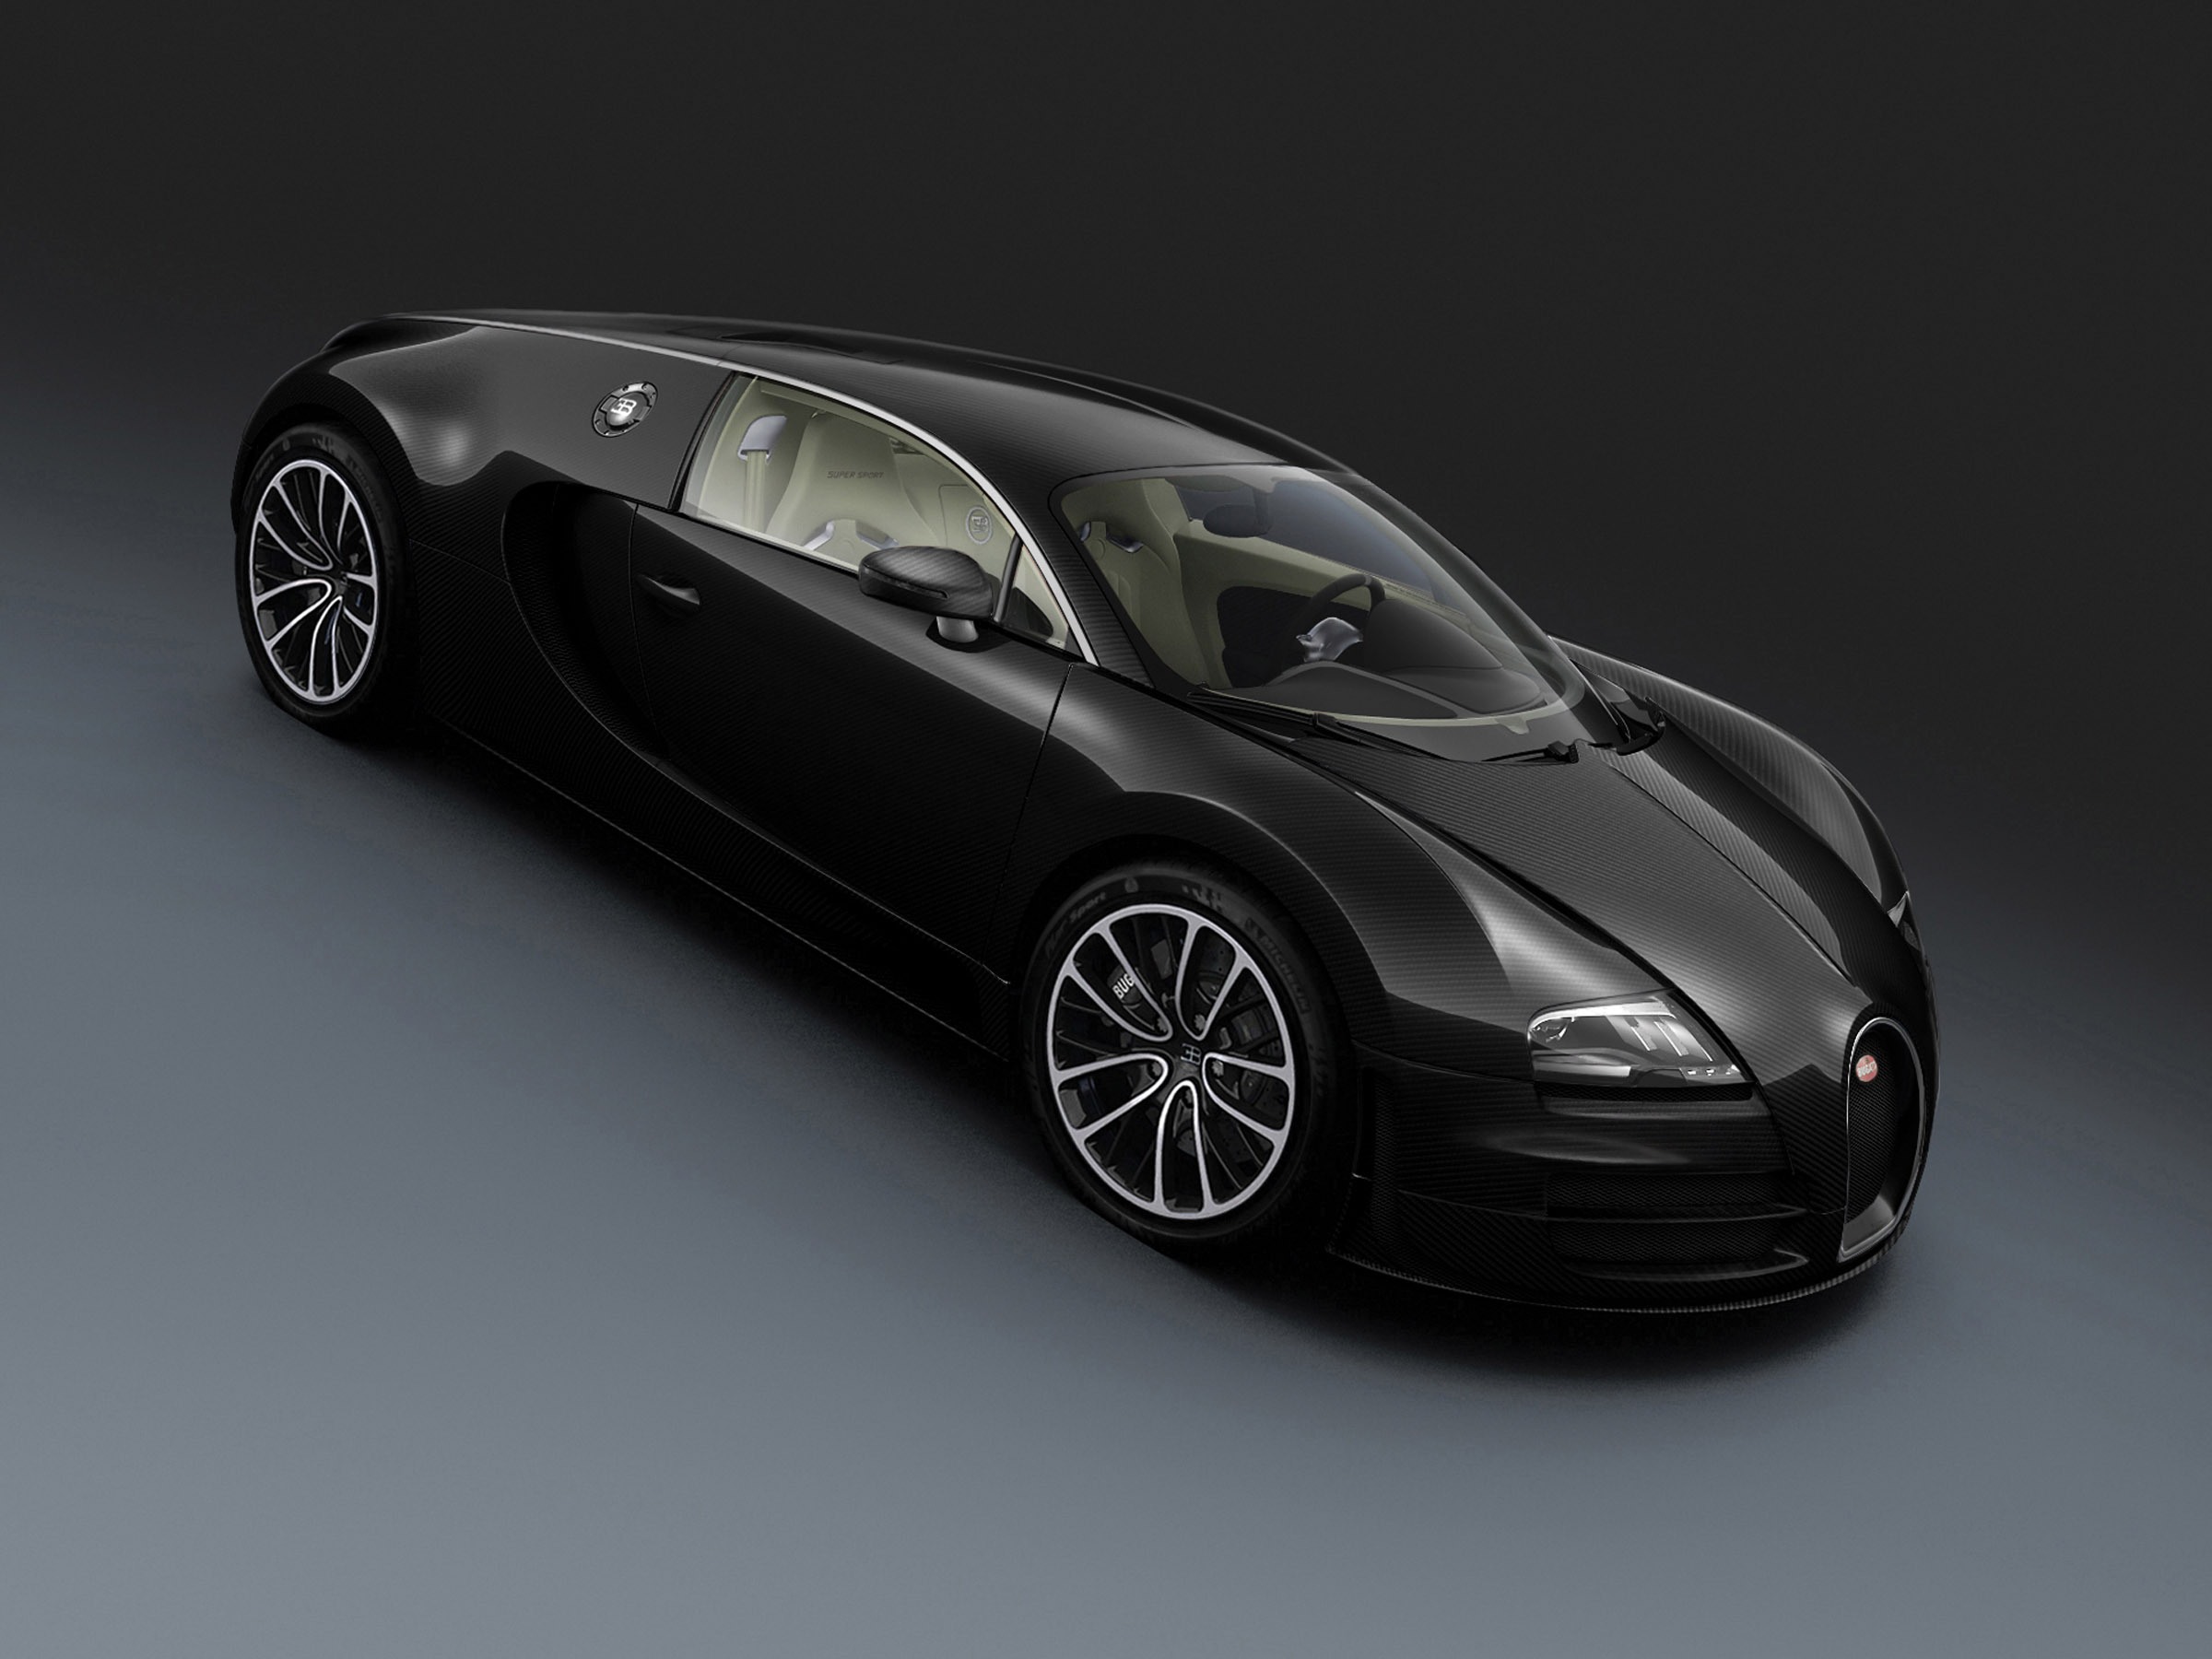 Bugatti Veyron 16 4 Super Sport Shanghai 2011 Picture 53344